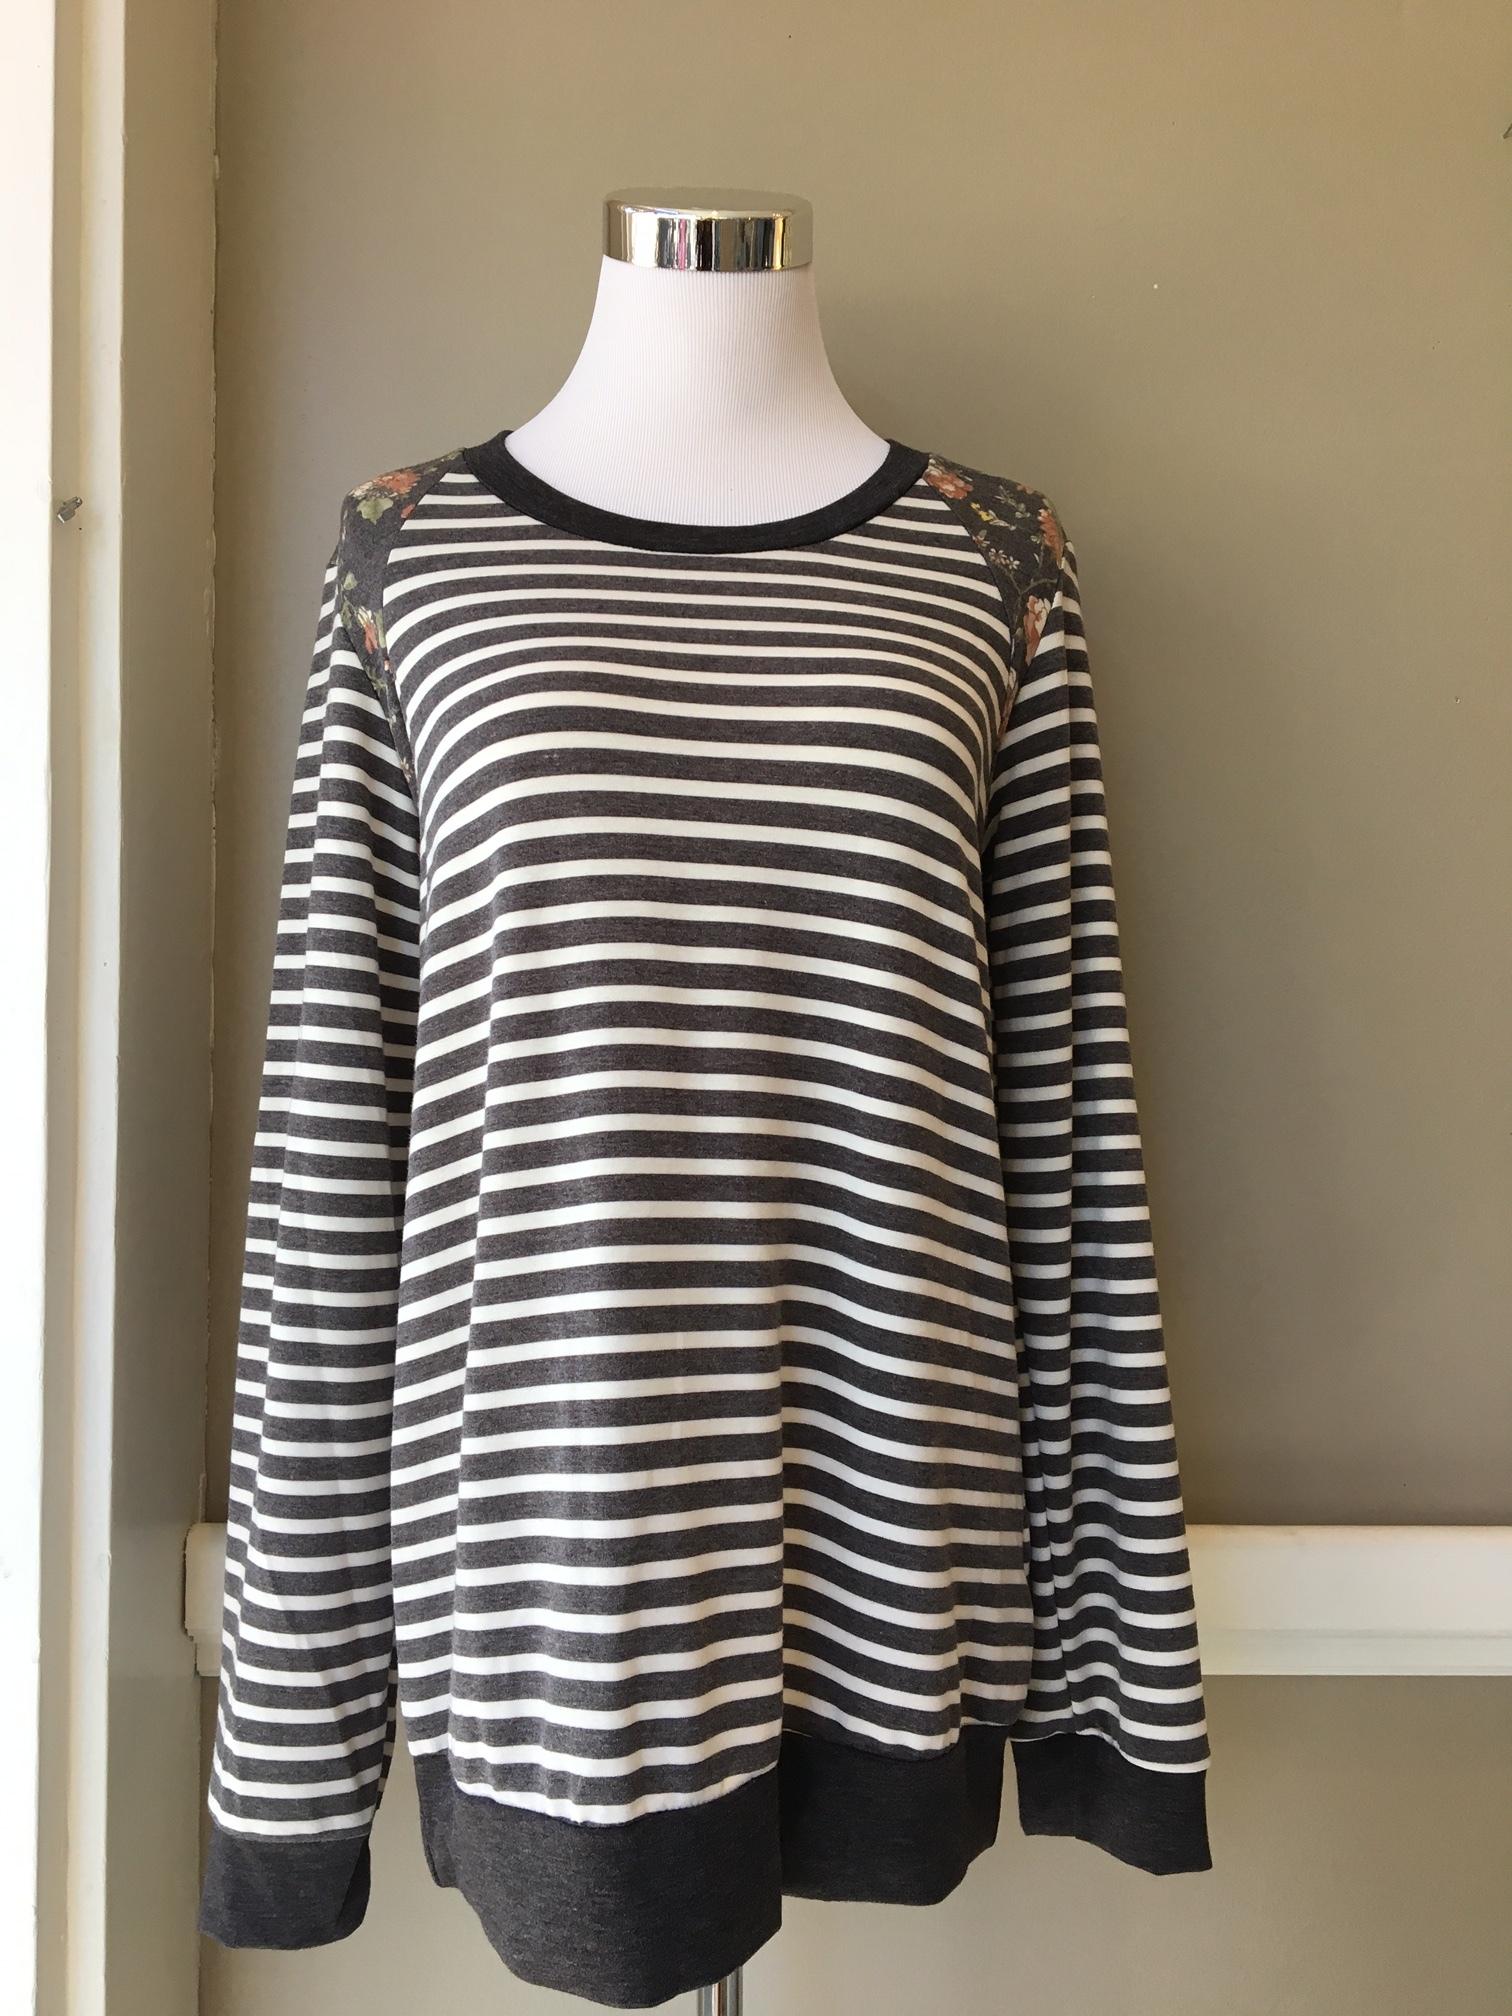 Striped Long Sleeve ($35)